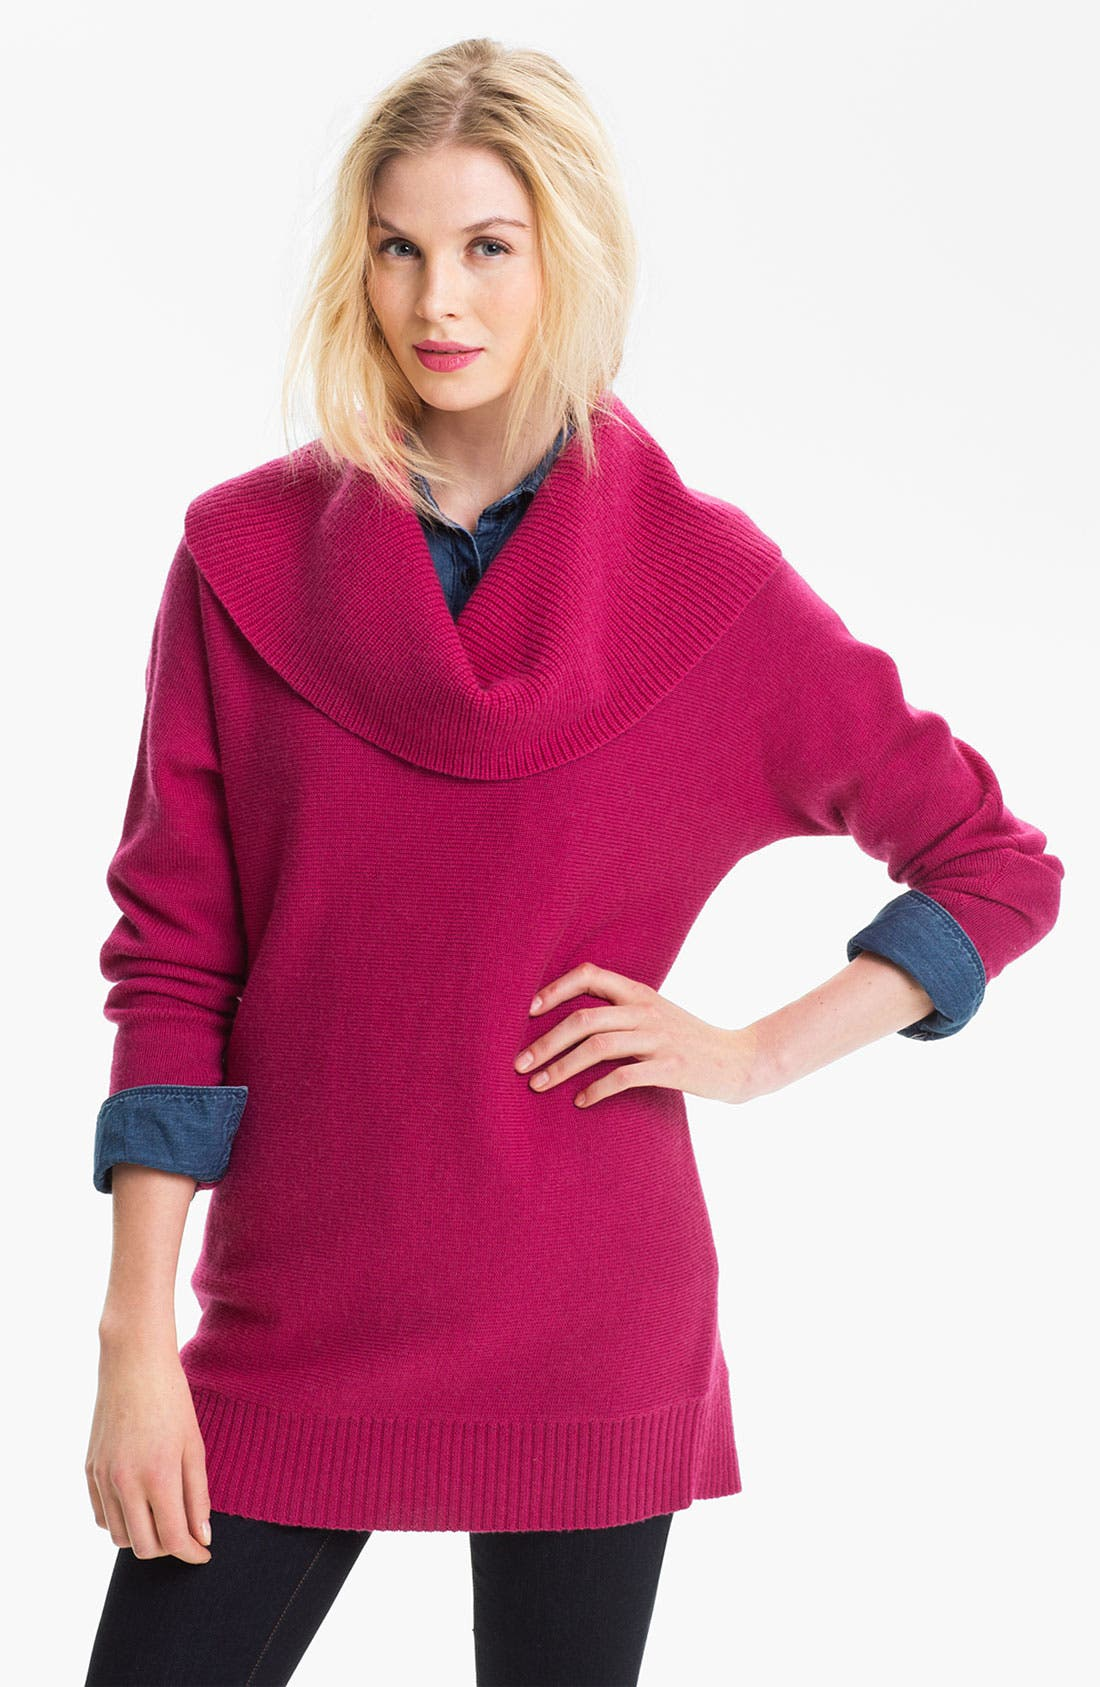 Alternate Image 1 Selected - Caslon® Cowl Neck Dolman Sweater